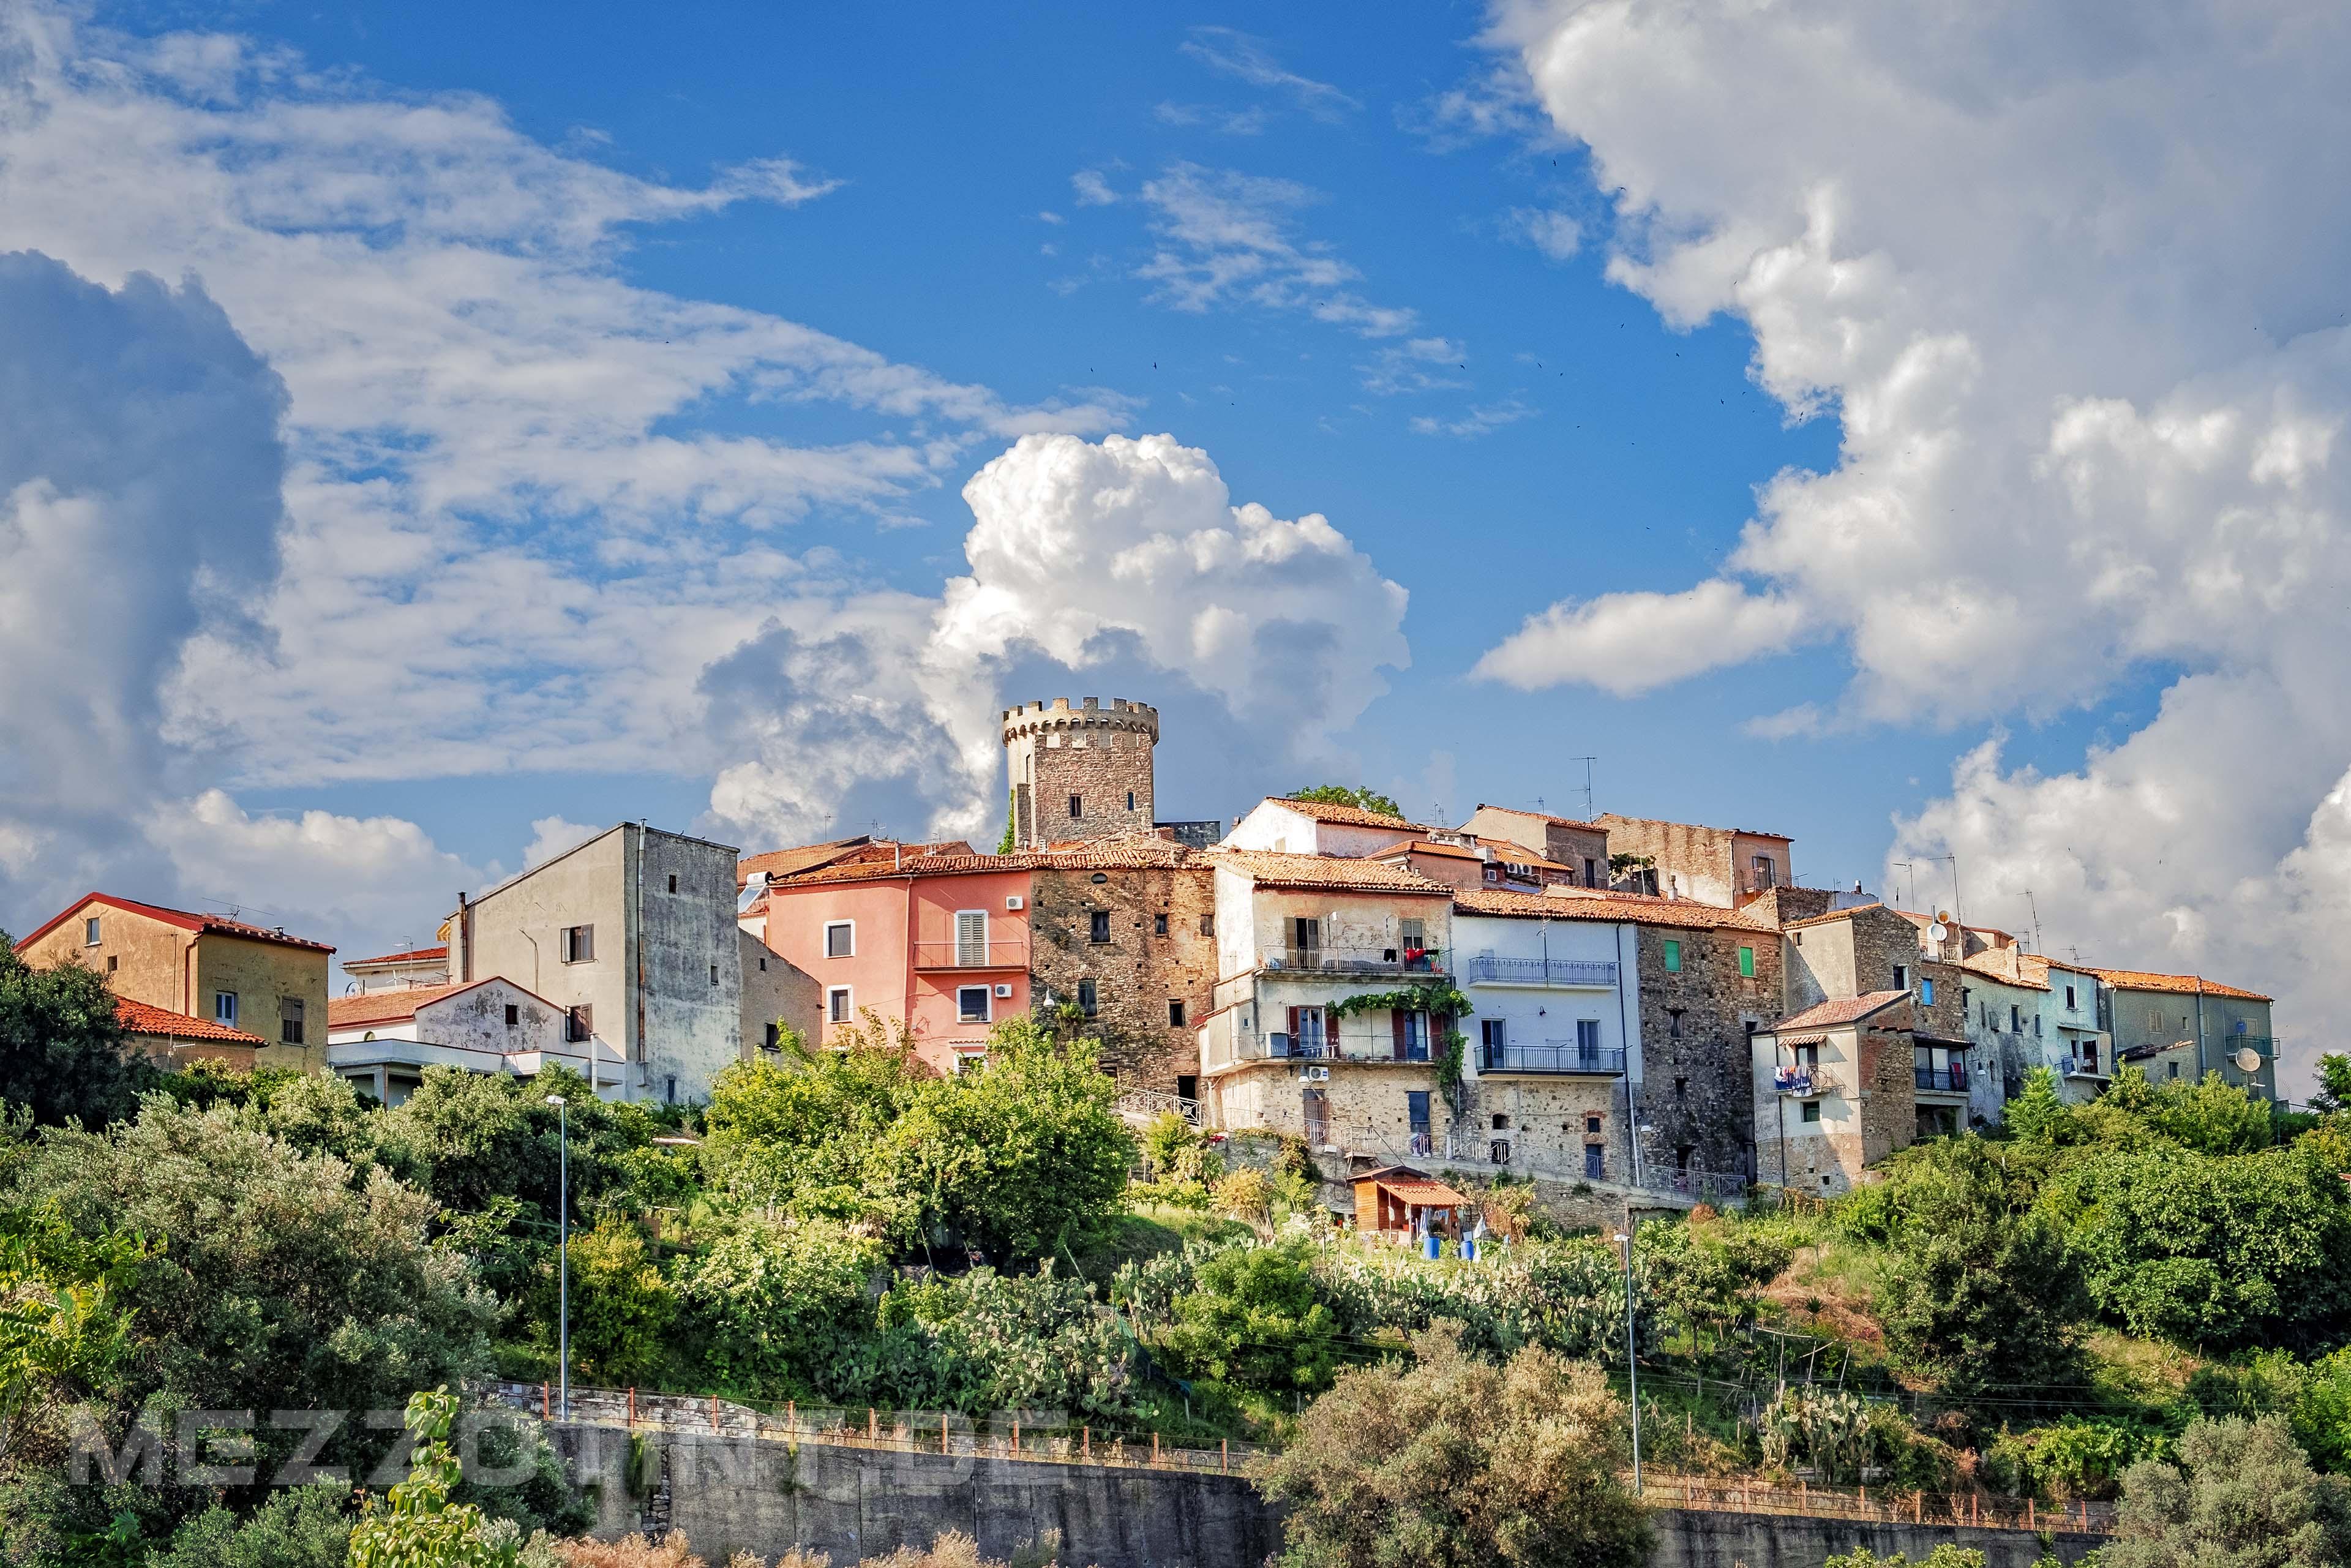 Castelnuovo at national park Cilento